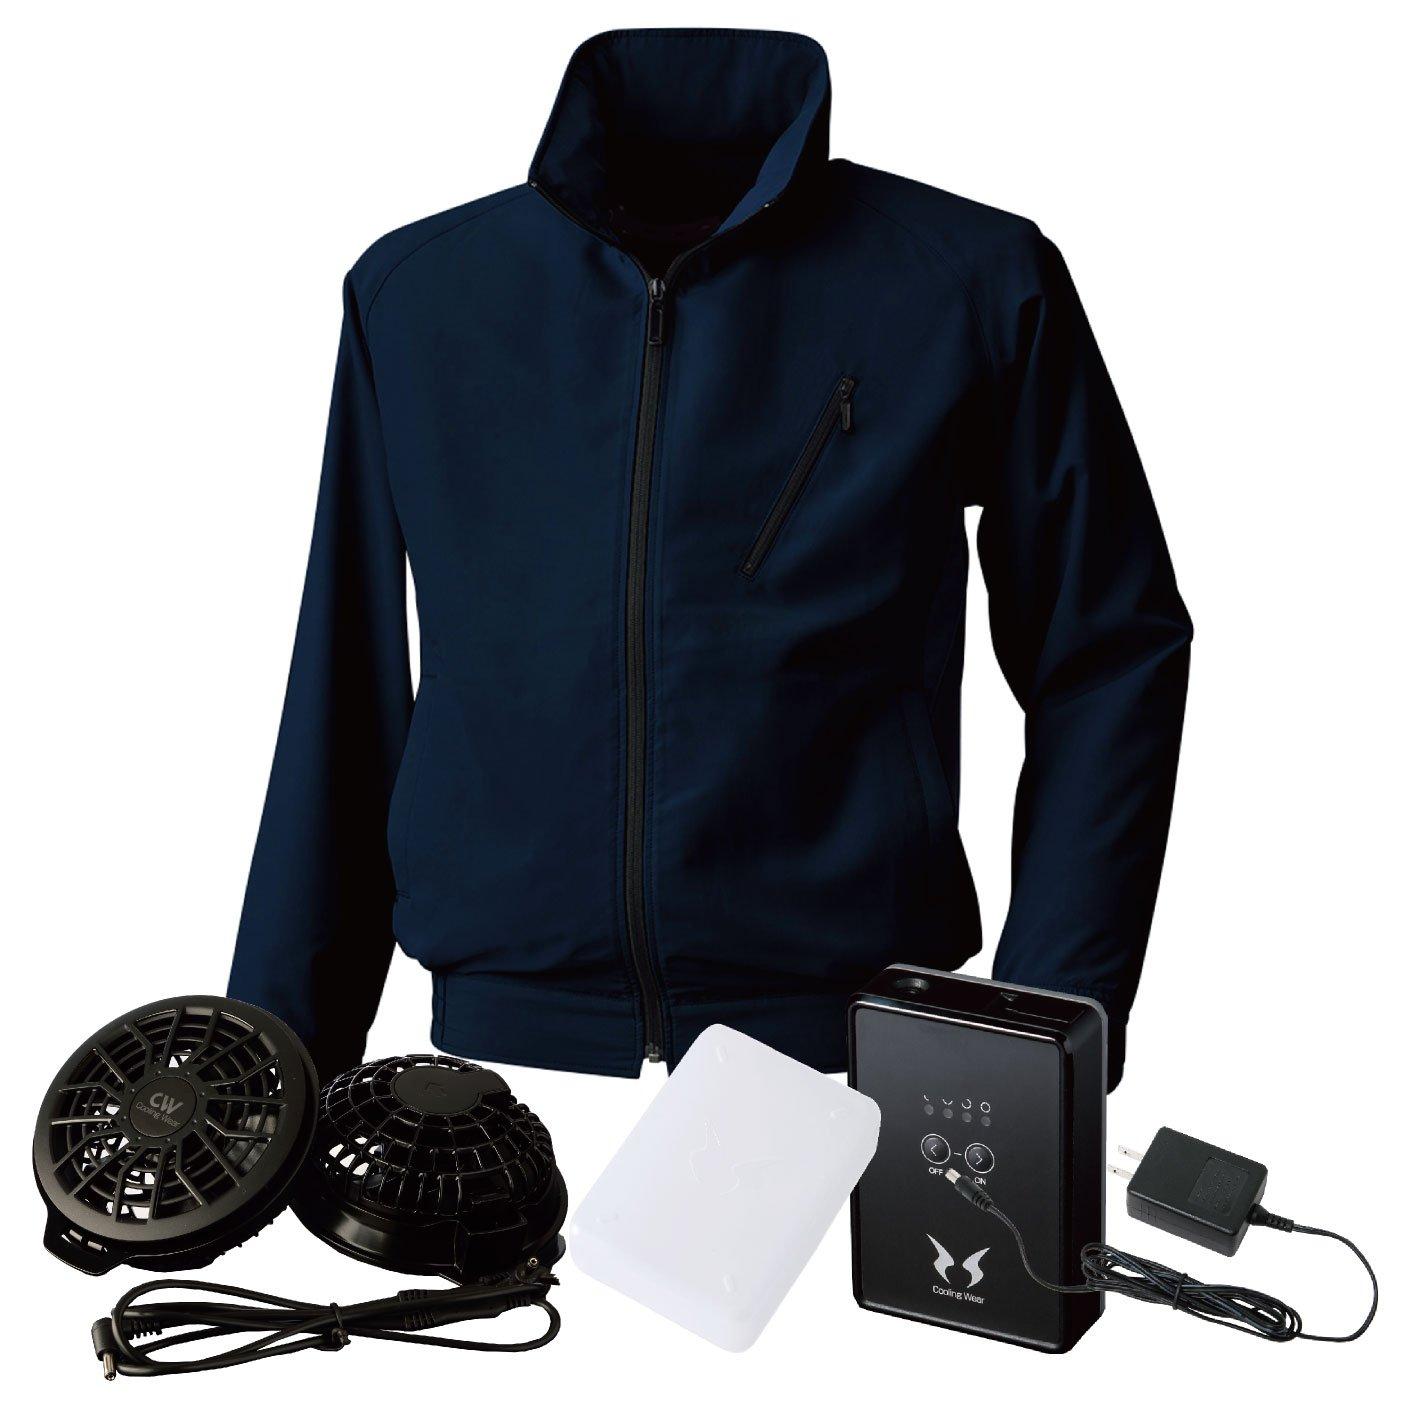 bigborn(ビッグボーン) 空調風神服 空調服 bb-bk6057-l 【空調服+ファン+バッテリー】 B07CSMHRBZ 4L|ネイビー ネイビー 4L